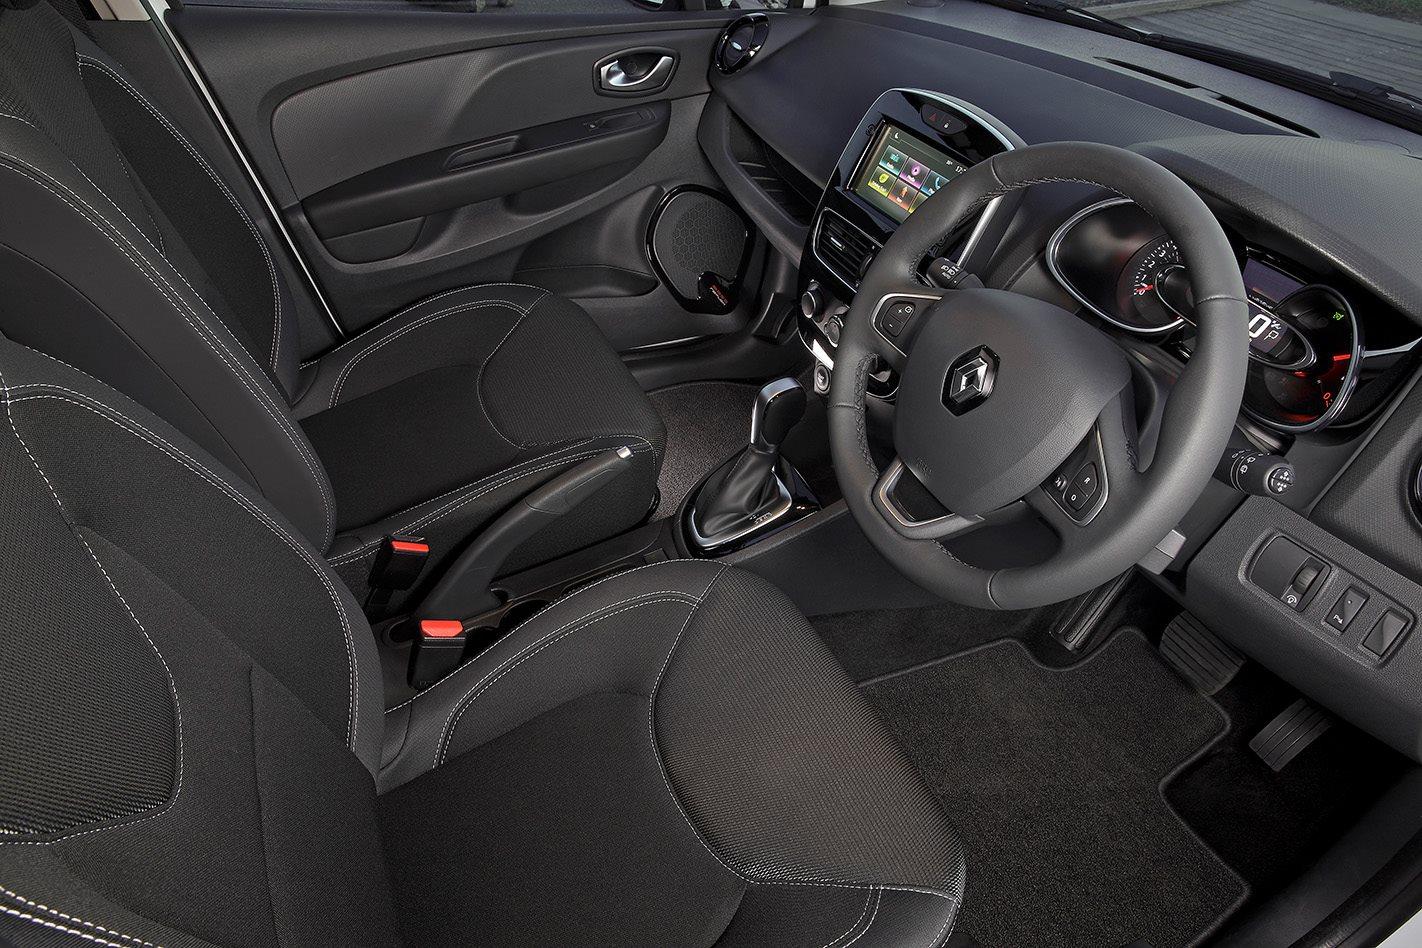 2017 Renault Clio Range Review